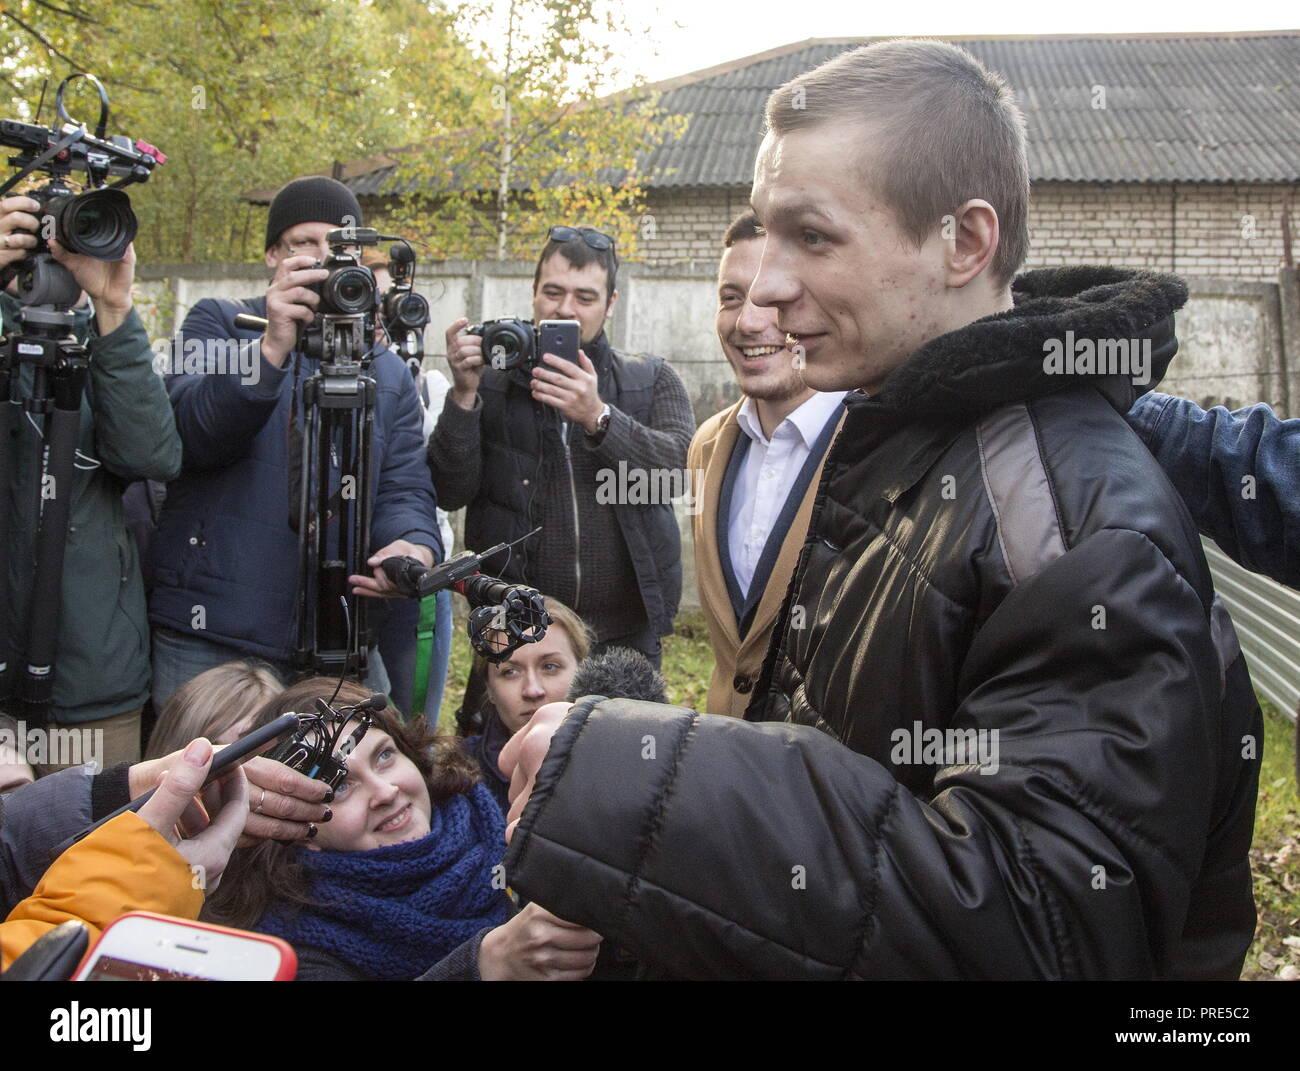 Yevgeny Vasilyev was sentenced to a real term 08/05/2015